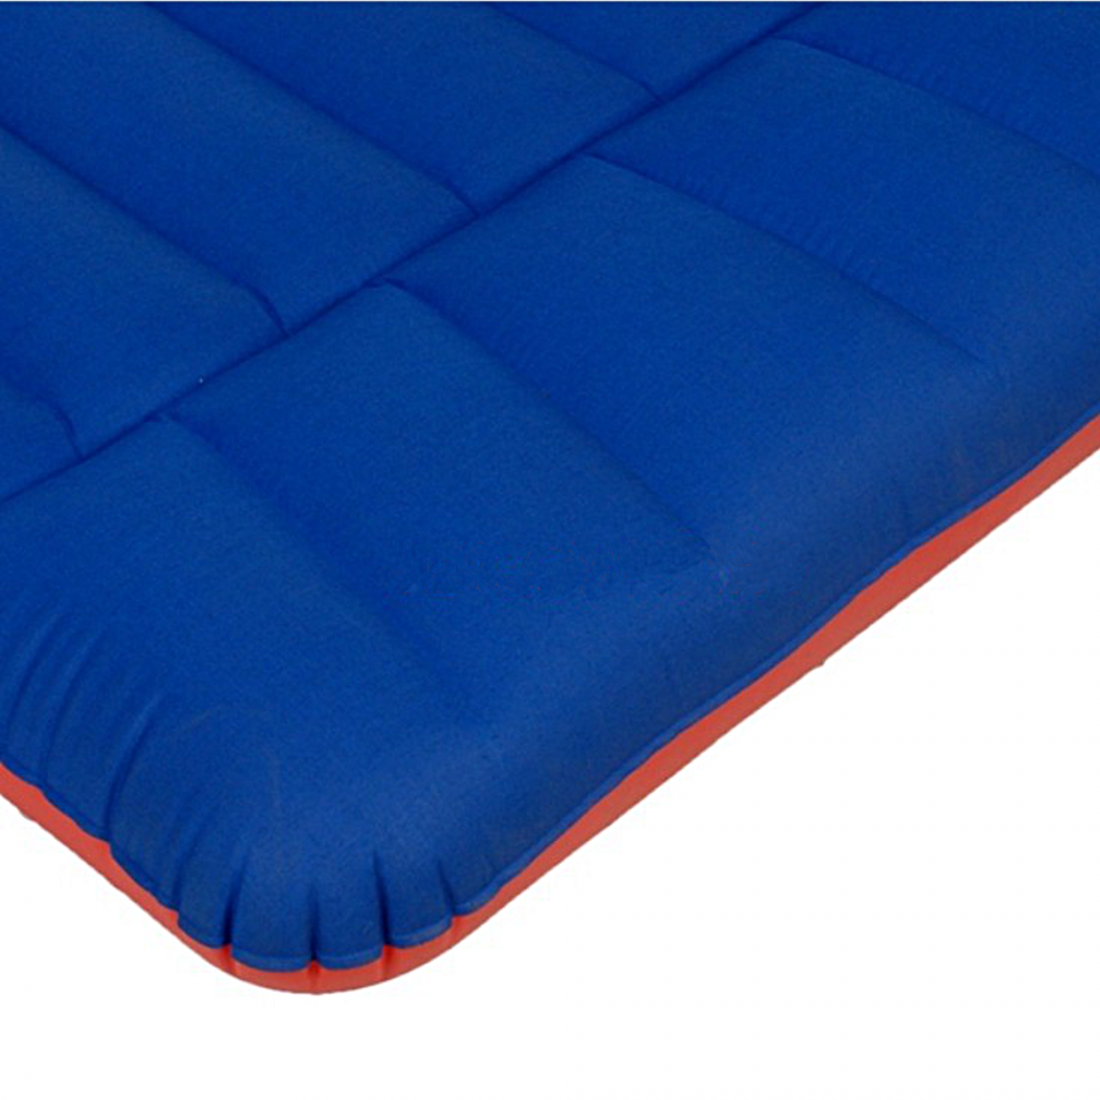 blueborn florida double doppel luftmatratze 195x140 cm ebay. Black Bedroom Furniture Sets. Home Design Ideas